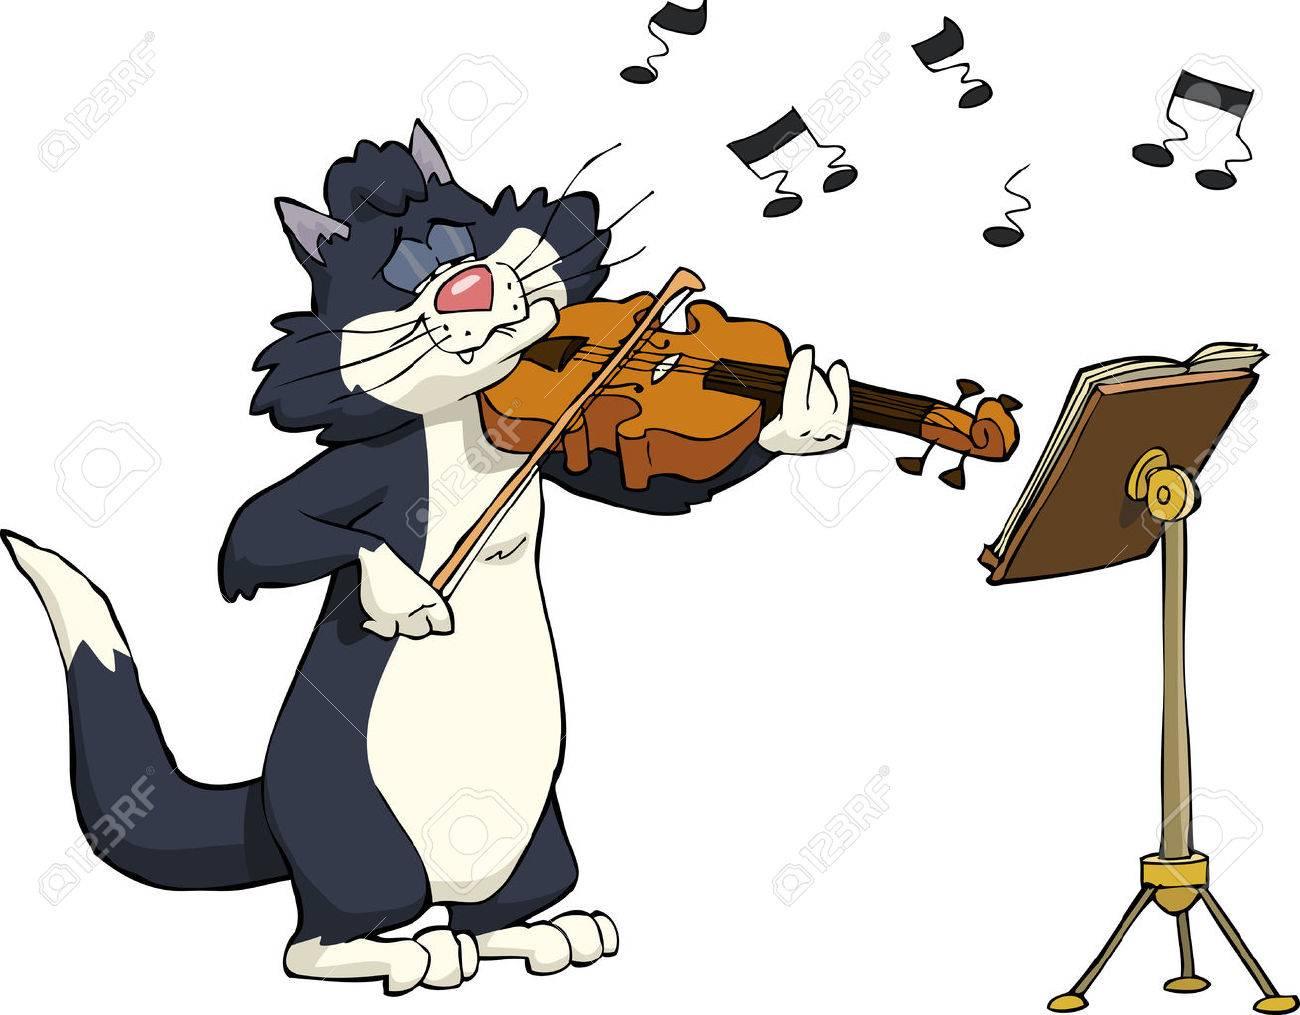 Cartoon cat playing the violin vector illustration - 35293682